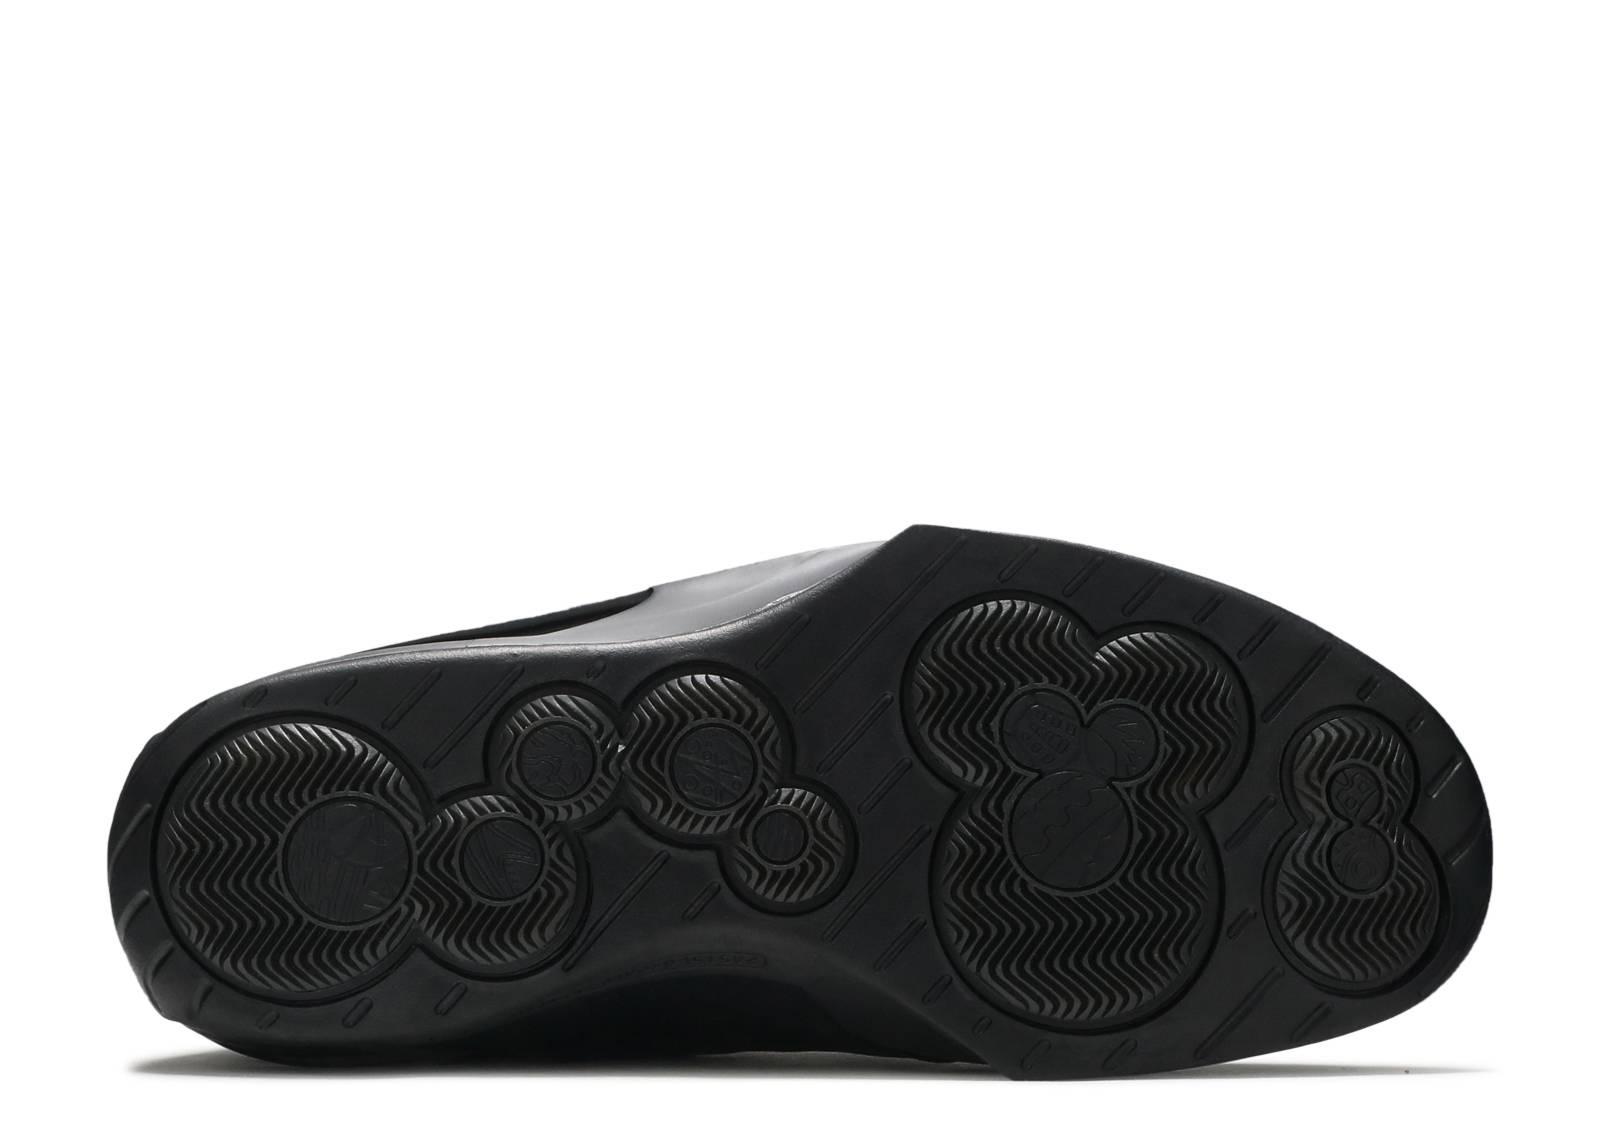 7583ee4cfc1 Black Air Jordan 20 Nike Running Shoes 2 Men Sale | MobiHealthNews